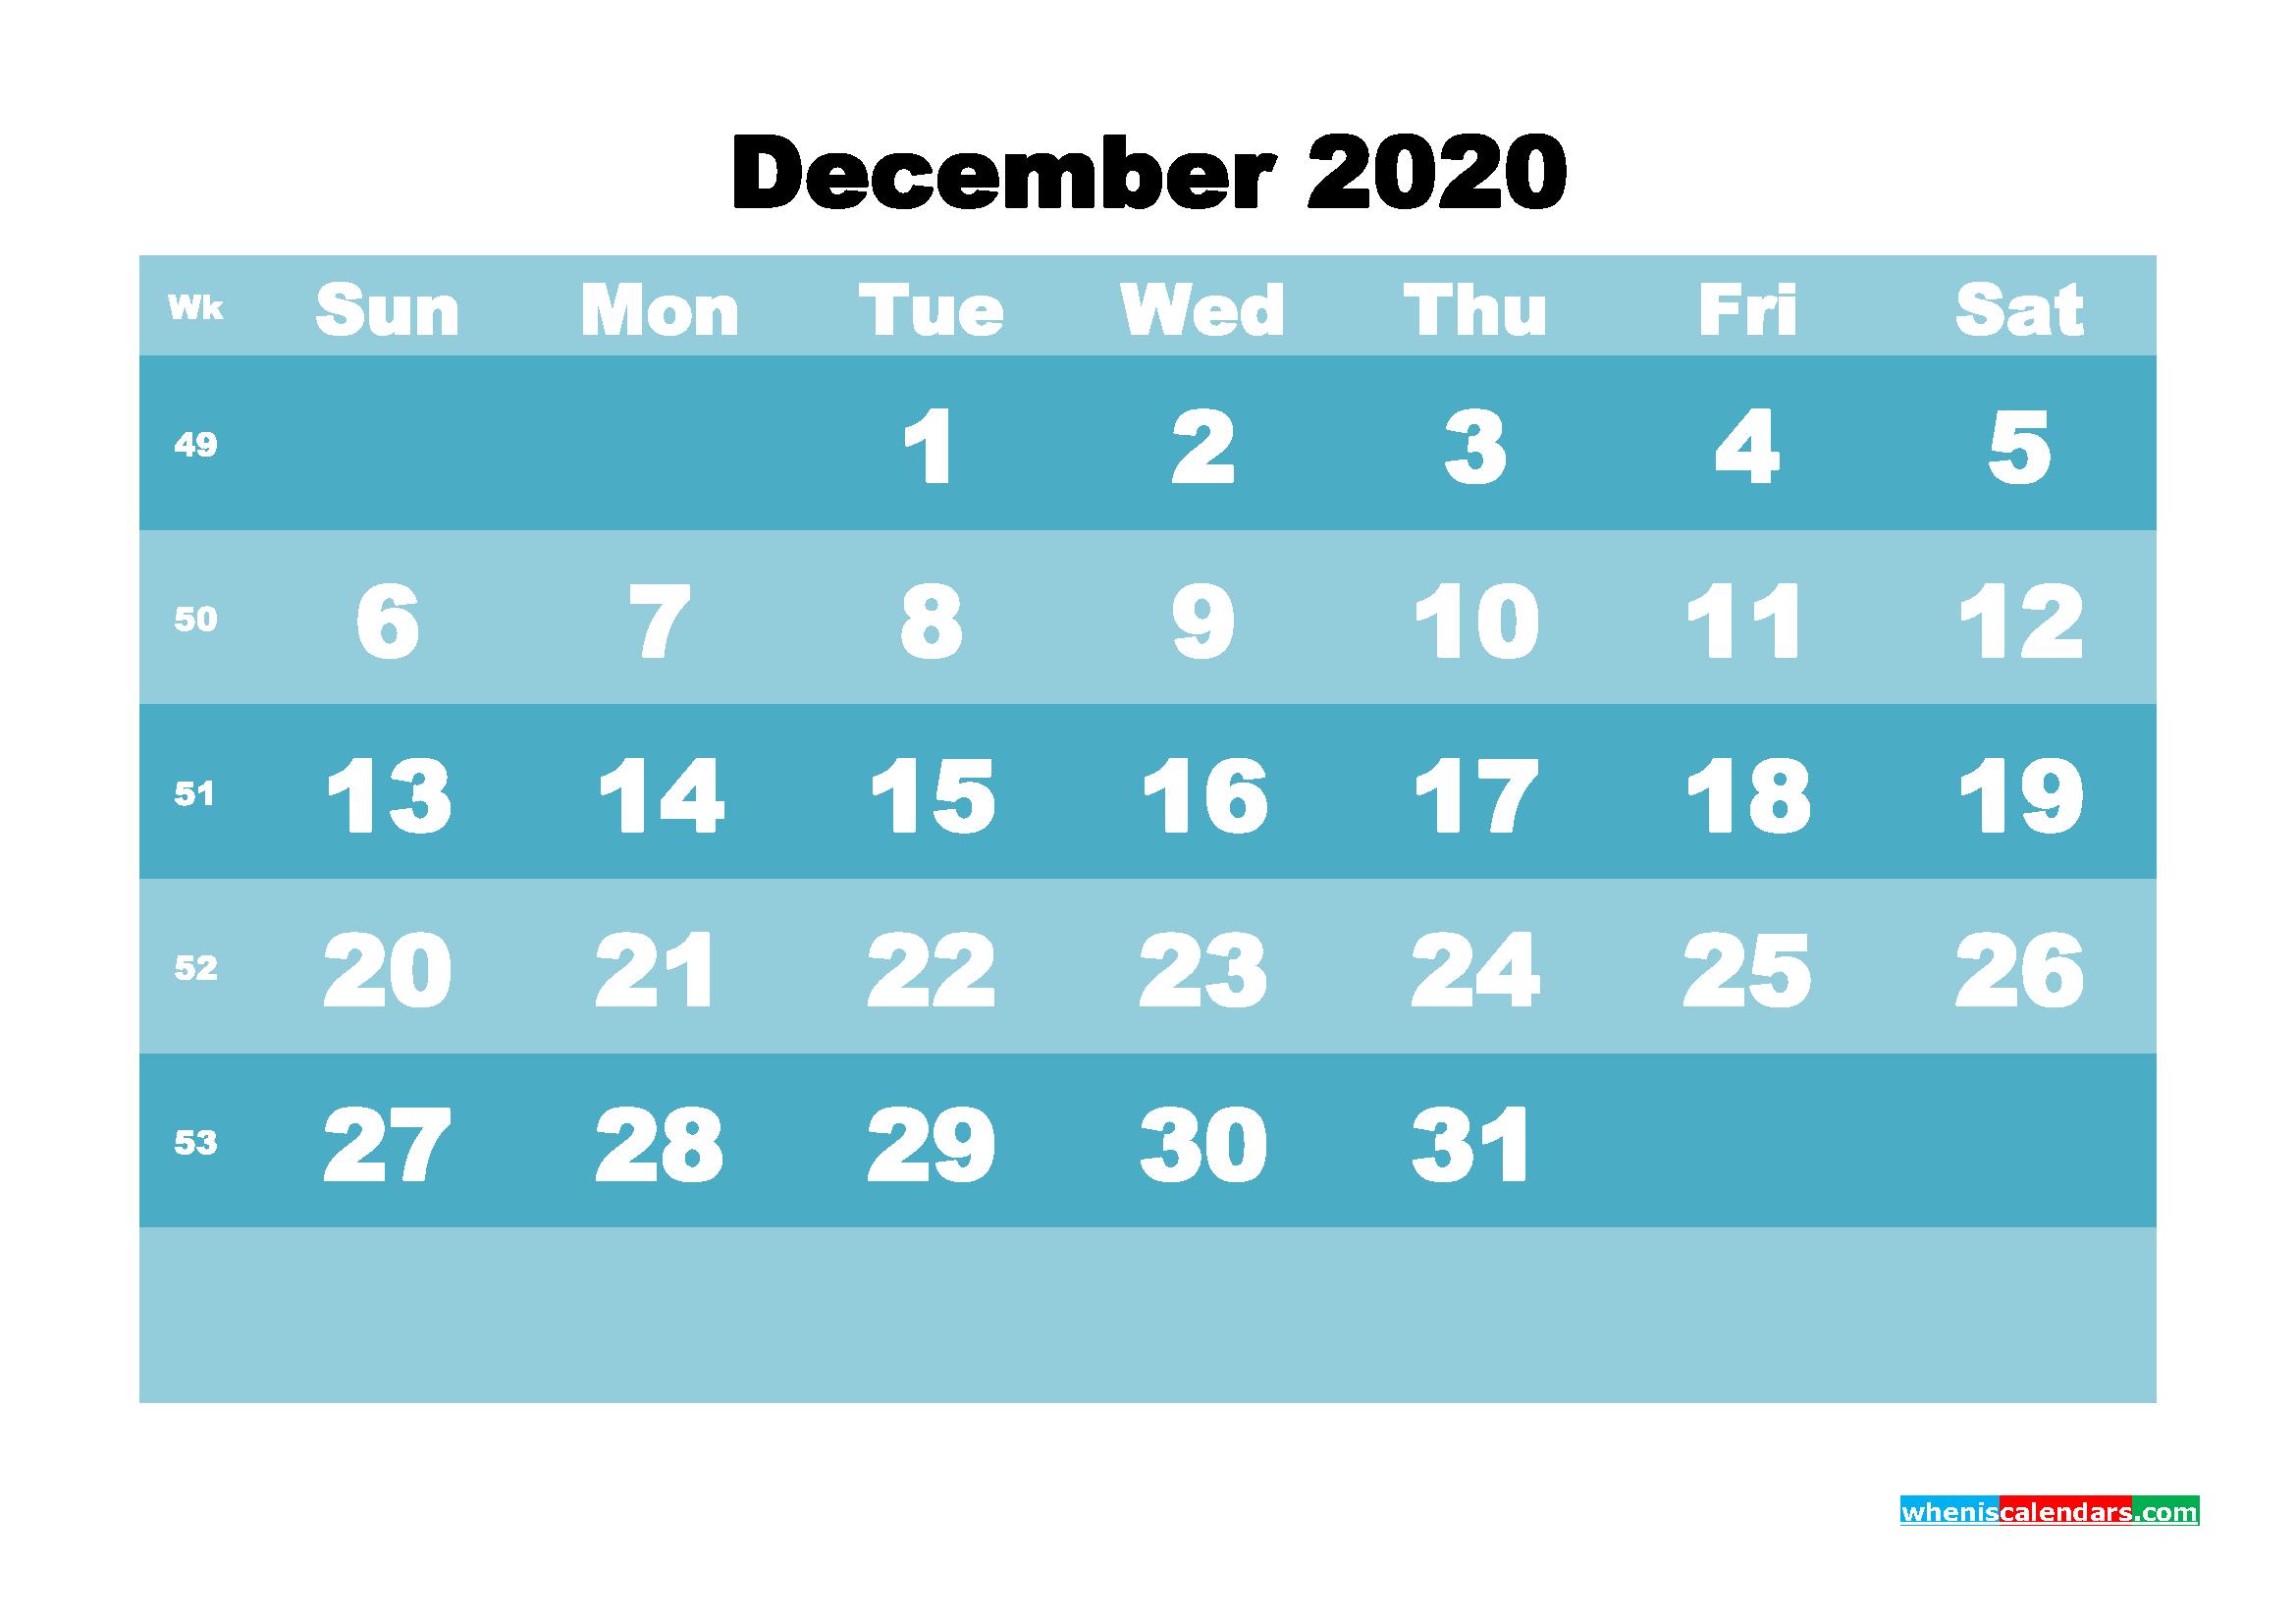 December 2020 Blank Calendar Printable - No.m20b576